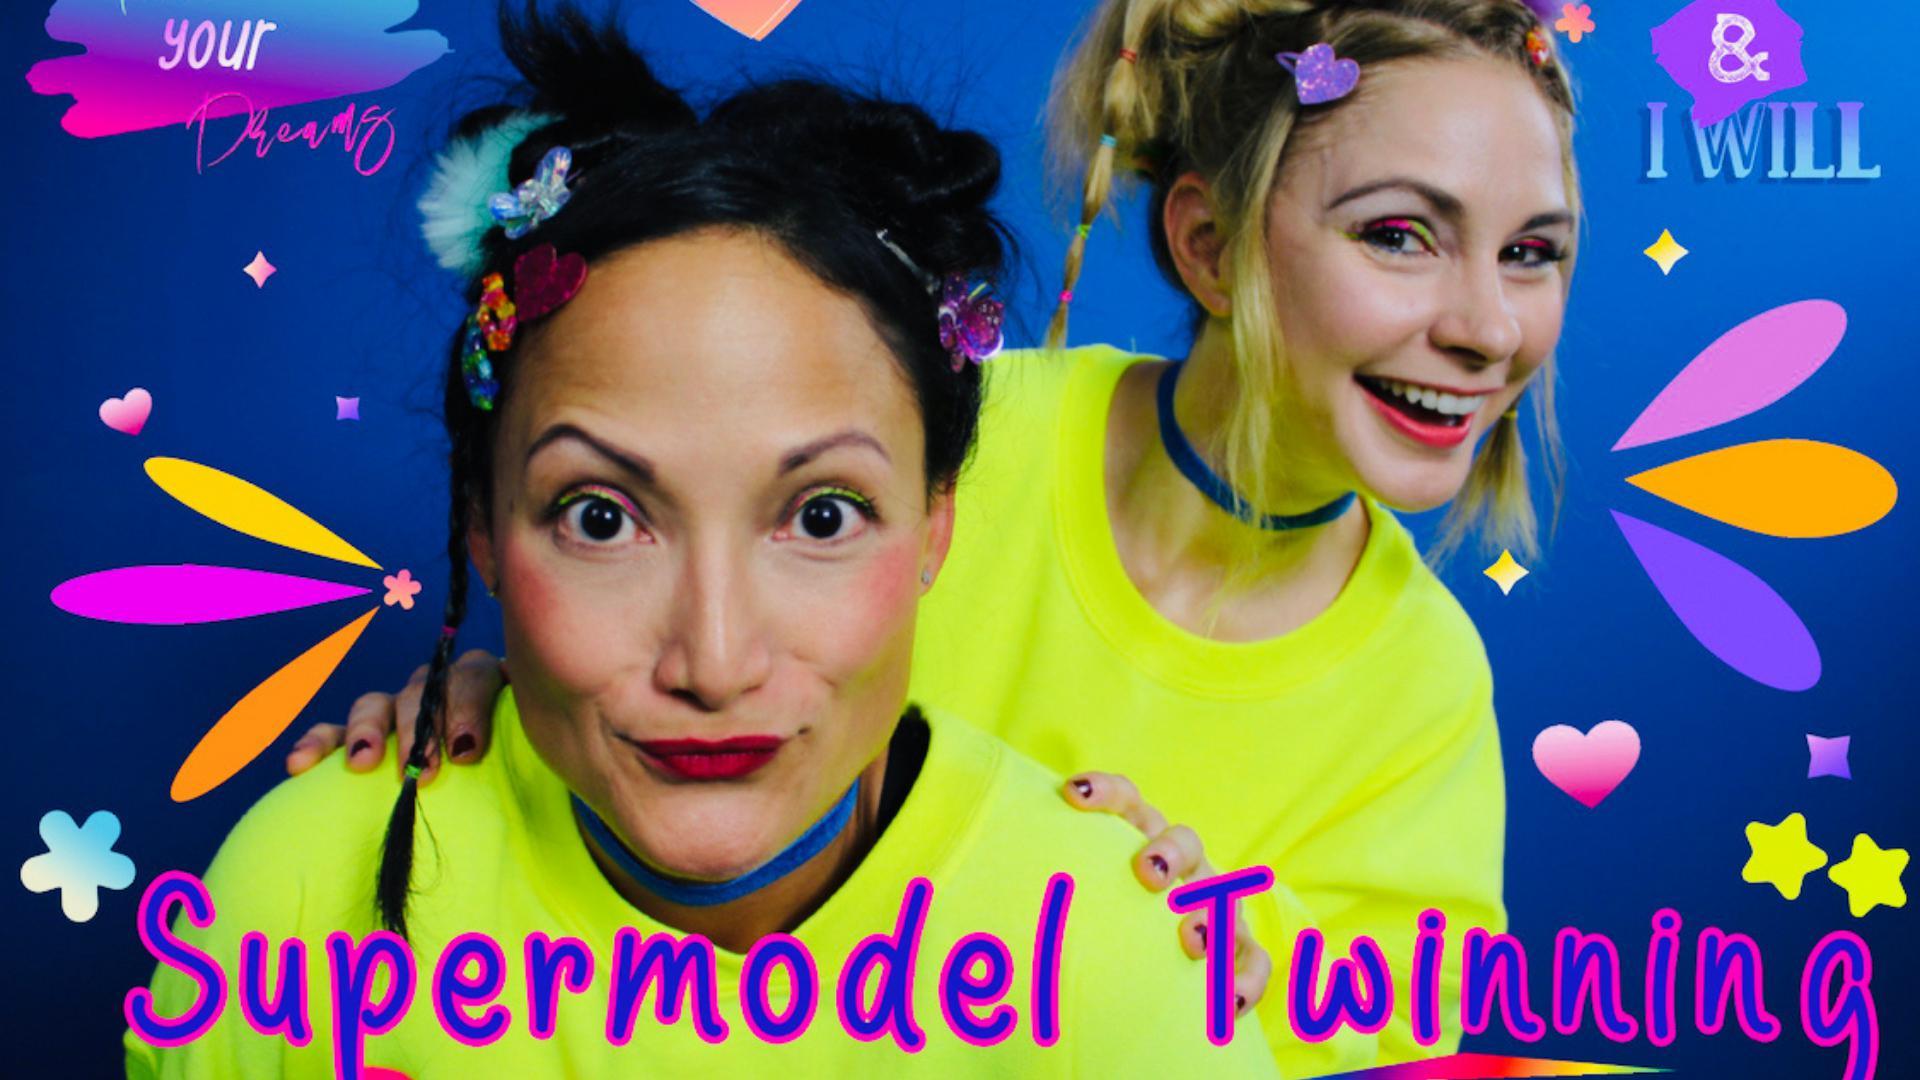 Supermodel Twinning